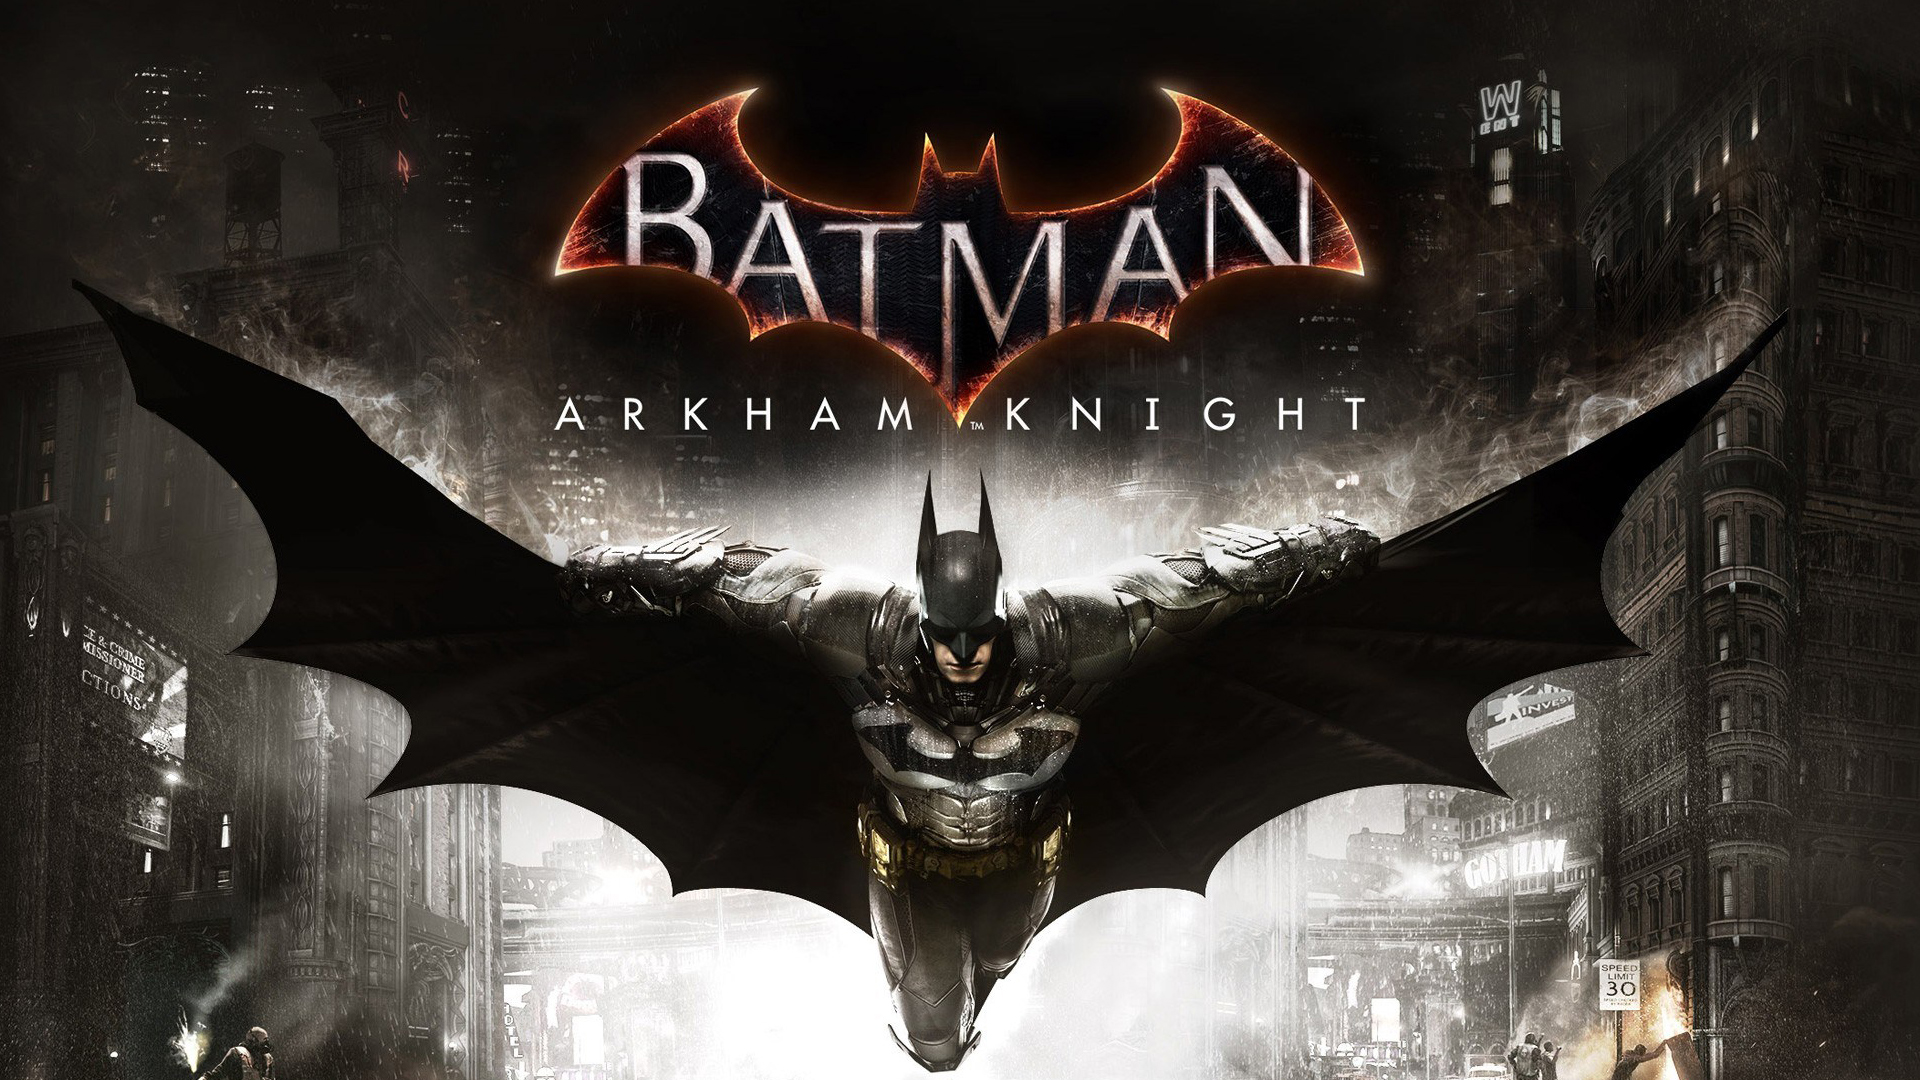 Batman Arkham Knight - Warner Bros. Issues New Statement ...